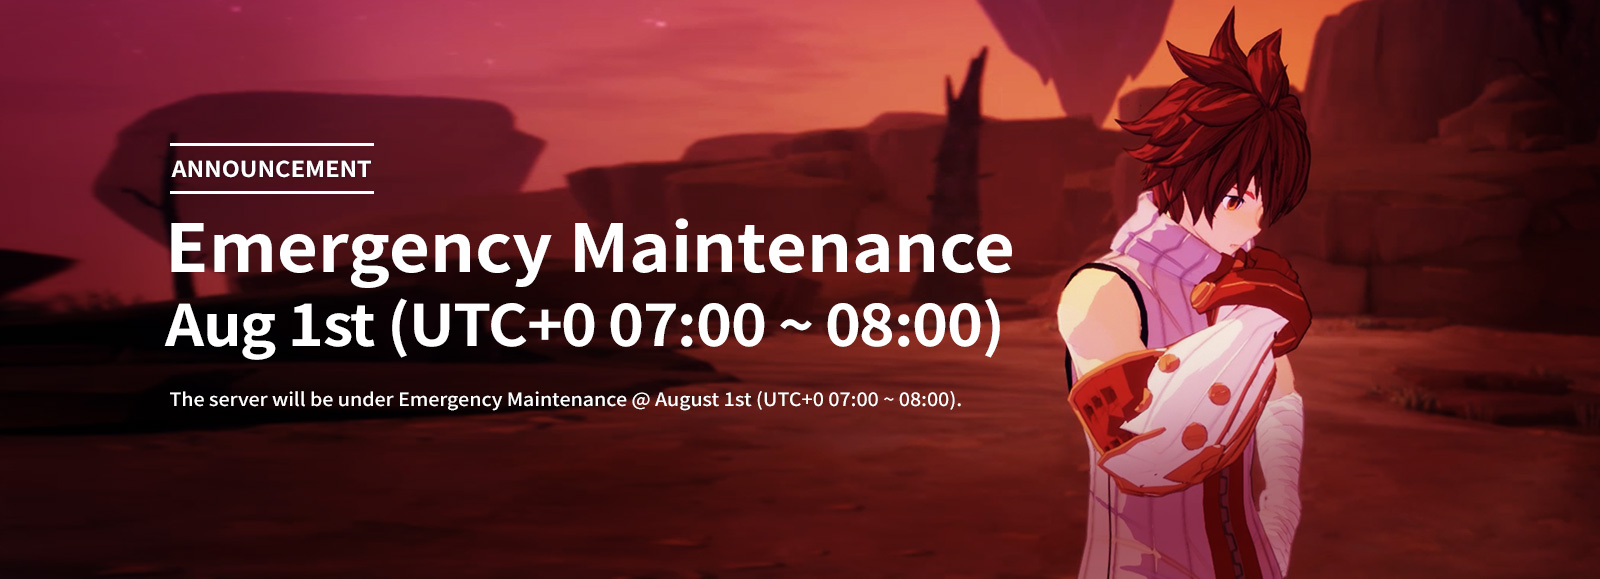 August 1st Emergency Maintenance Announcement